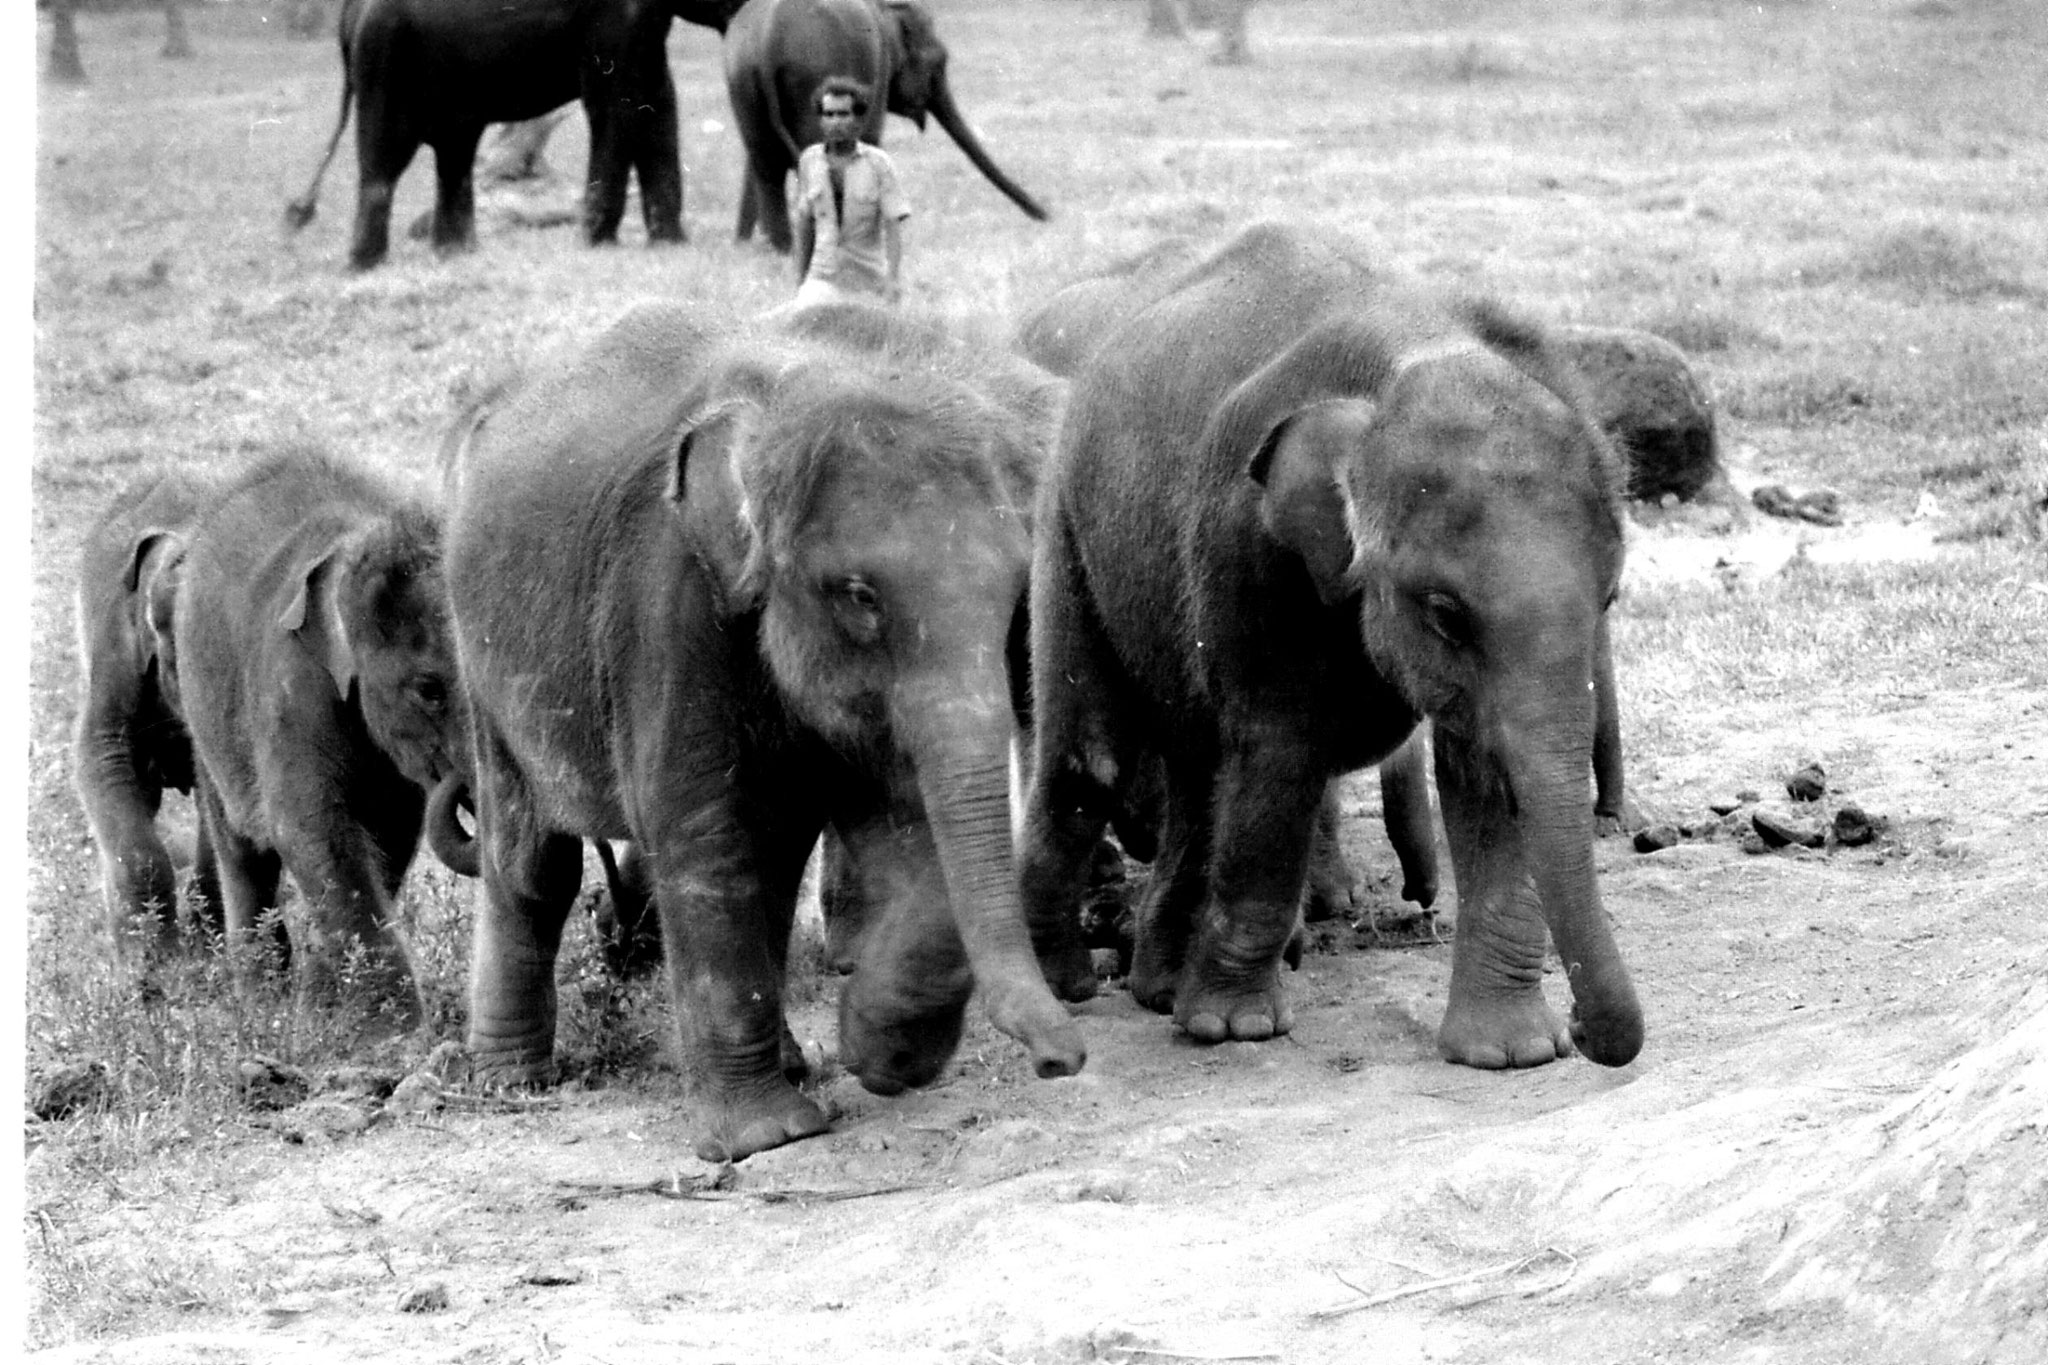 10/2/90: 32: Kegalla elephant orphanage